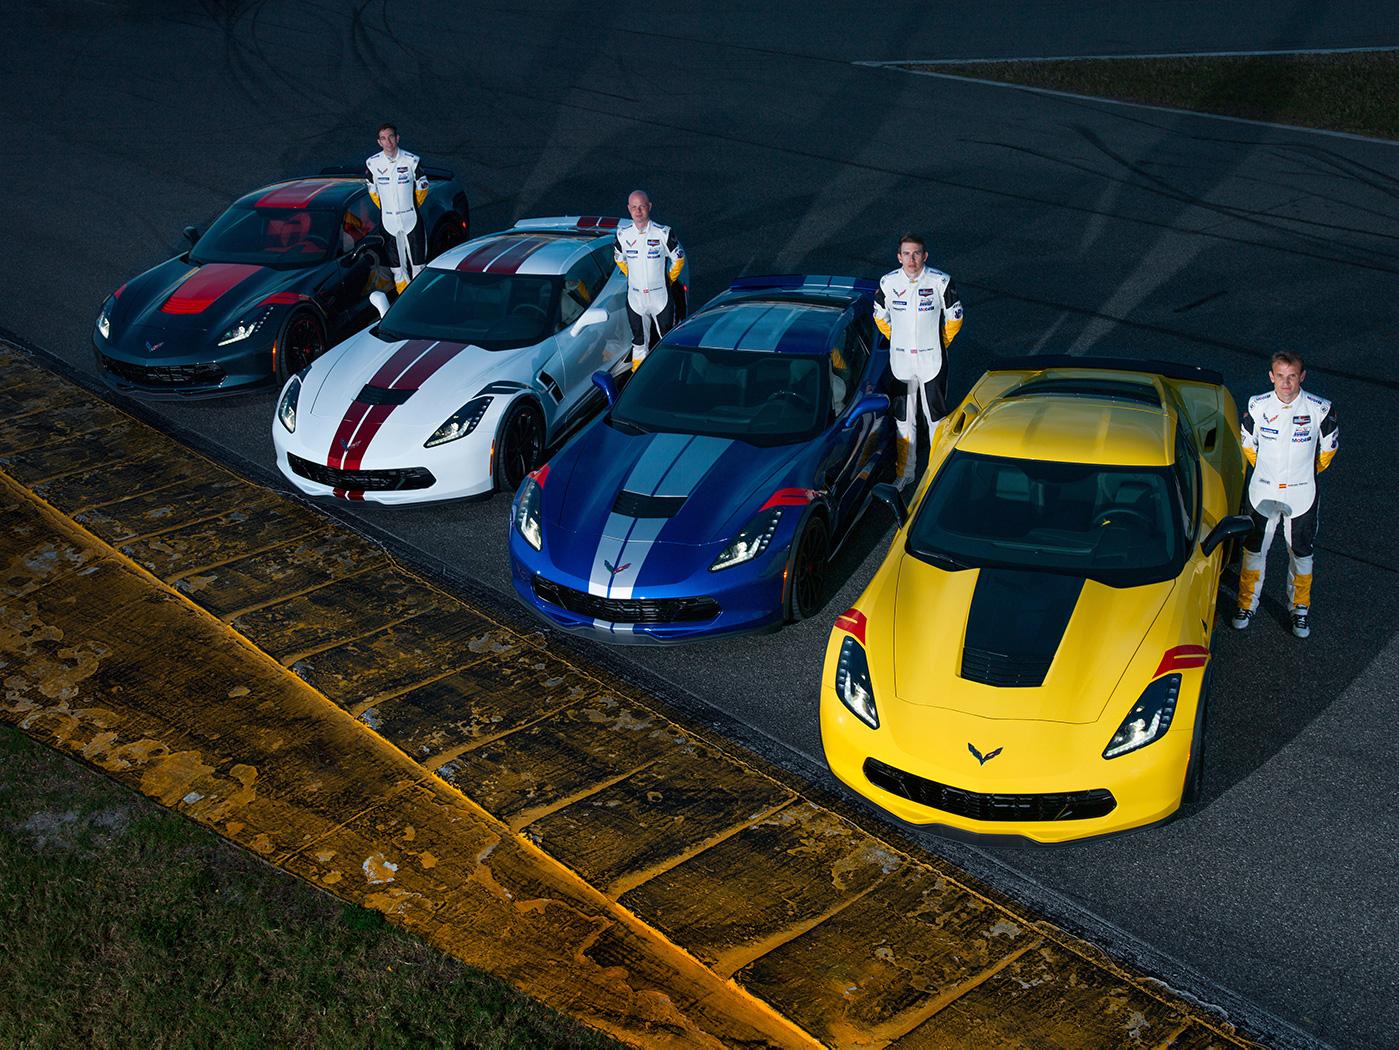 TrackWorthy-2019-Corvette-Drivers-Series-11